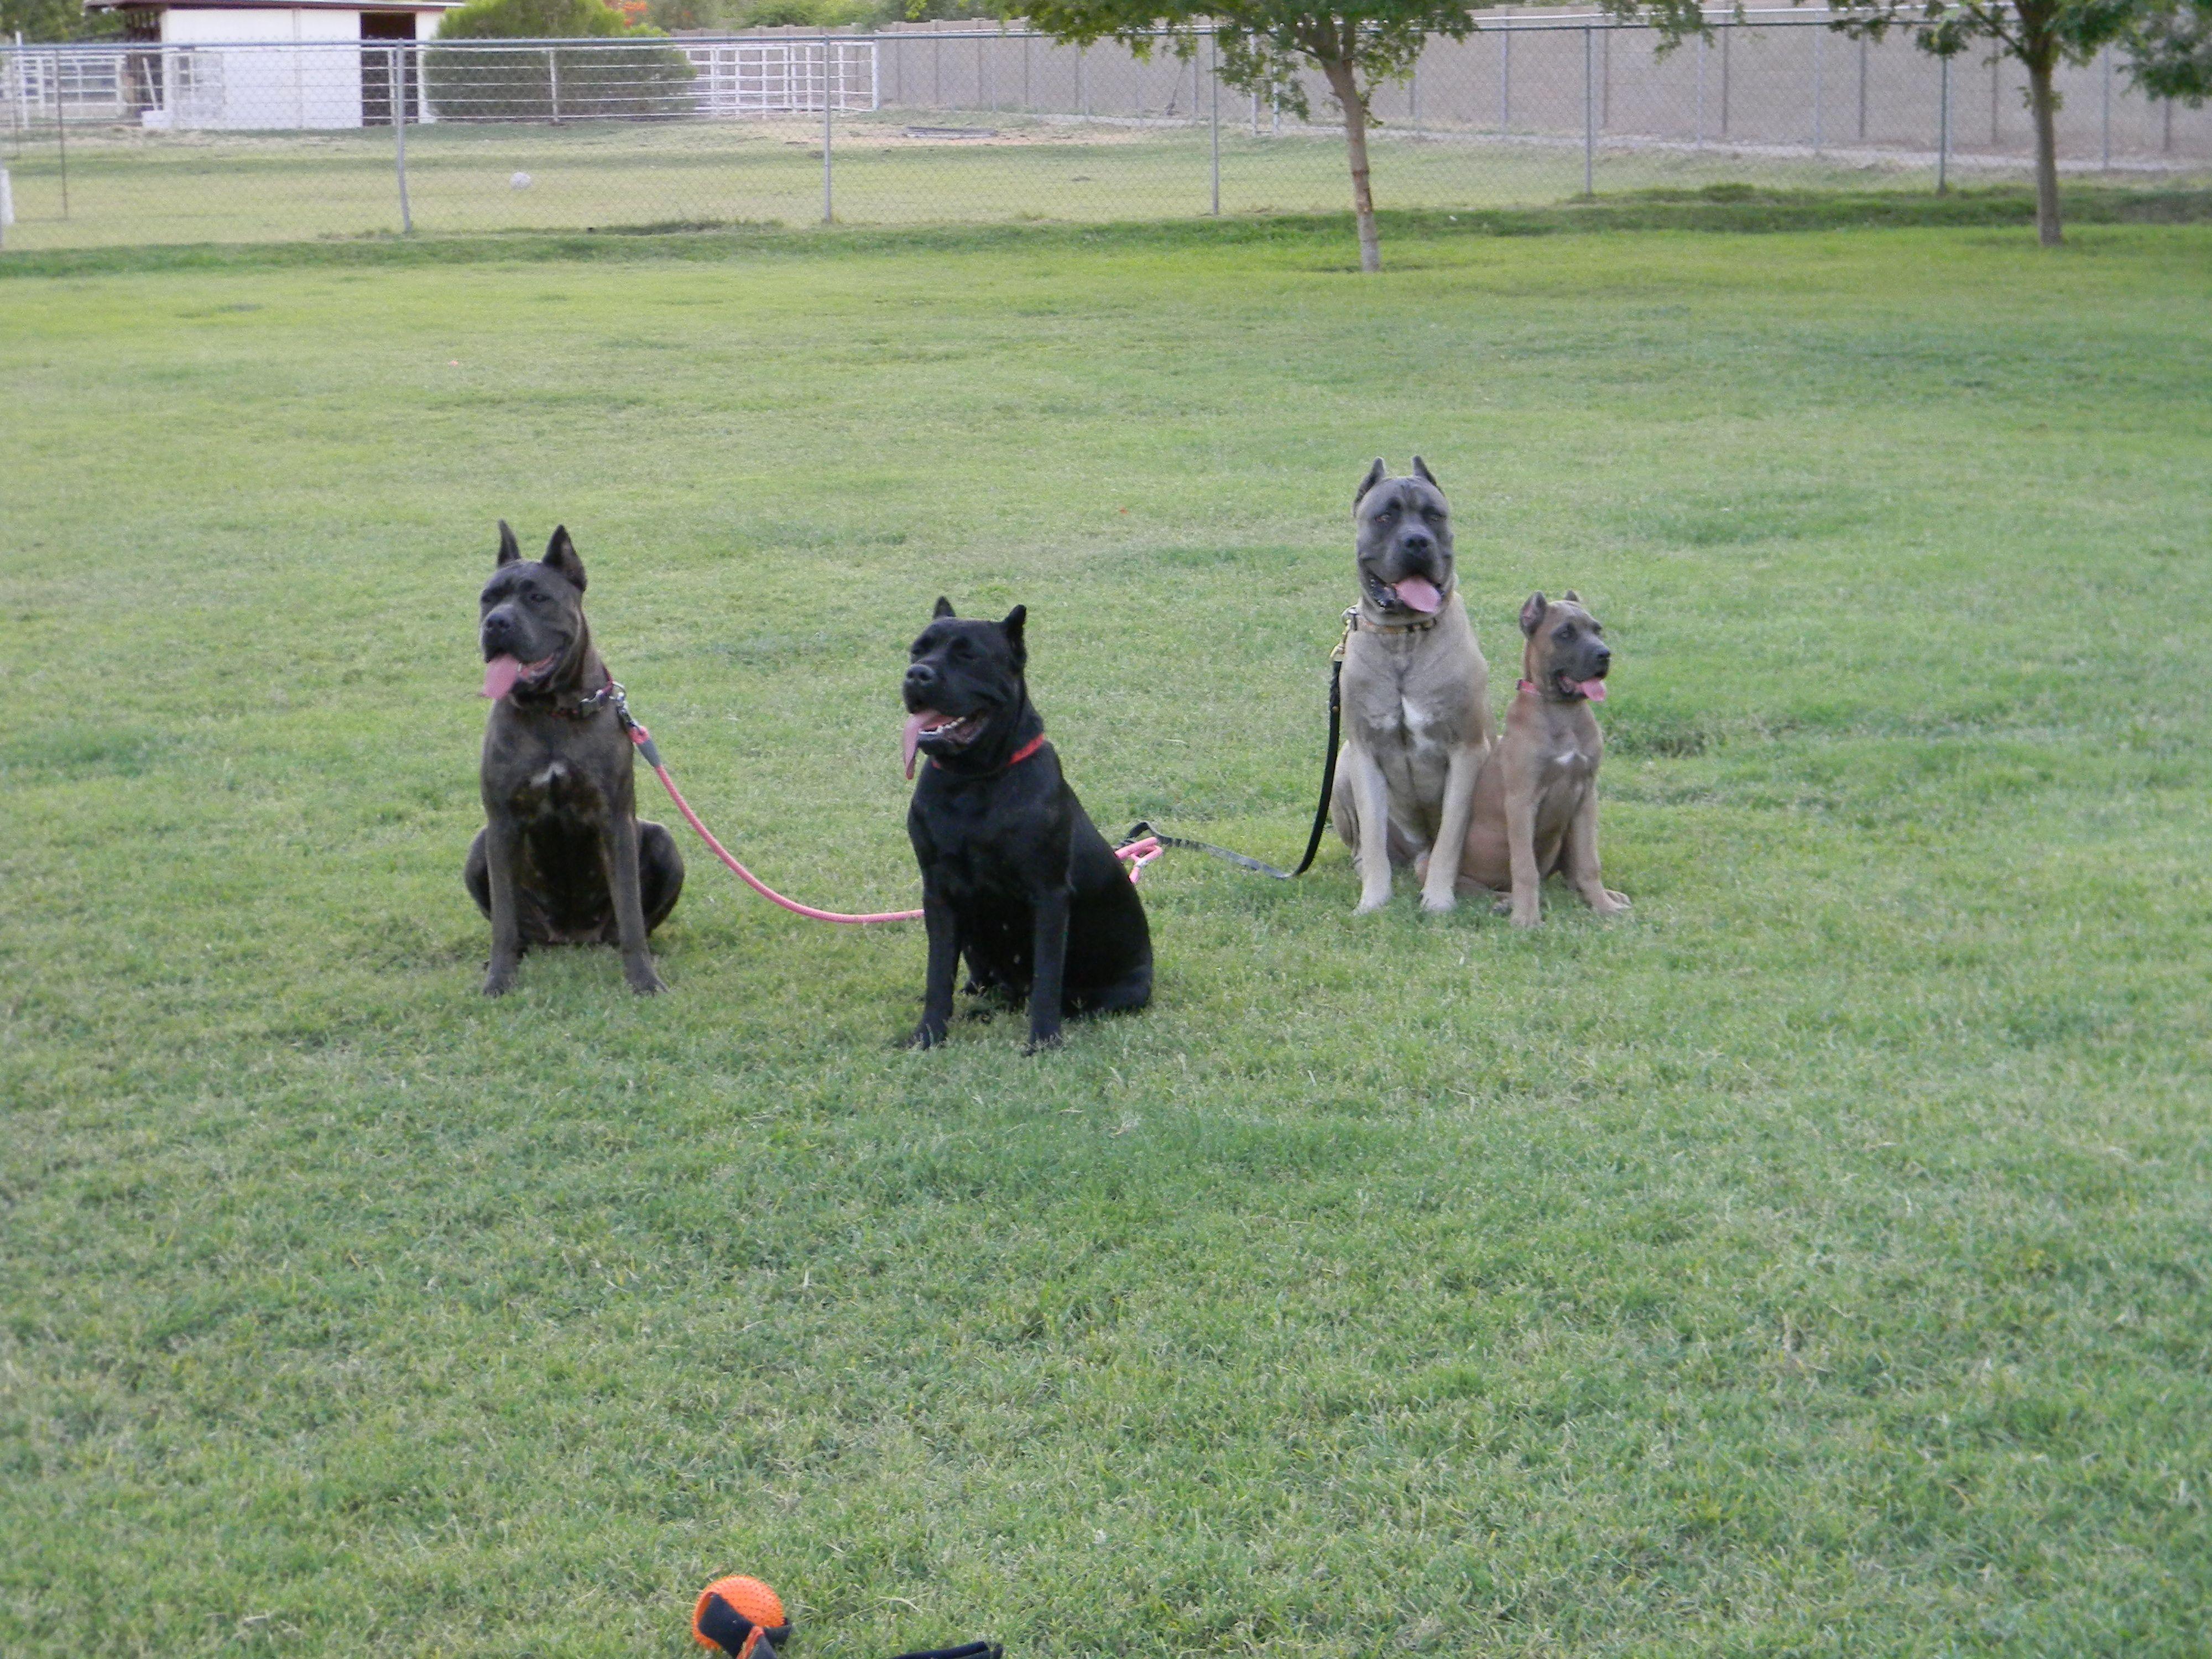 Cane Corso Breeder And Trainer Located In Gilbert Az Cane Corso